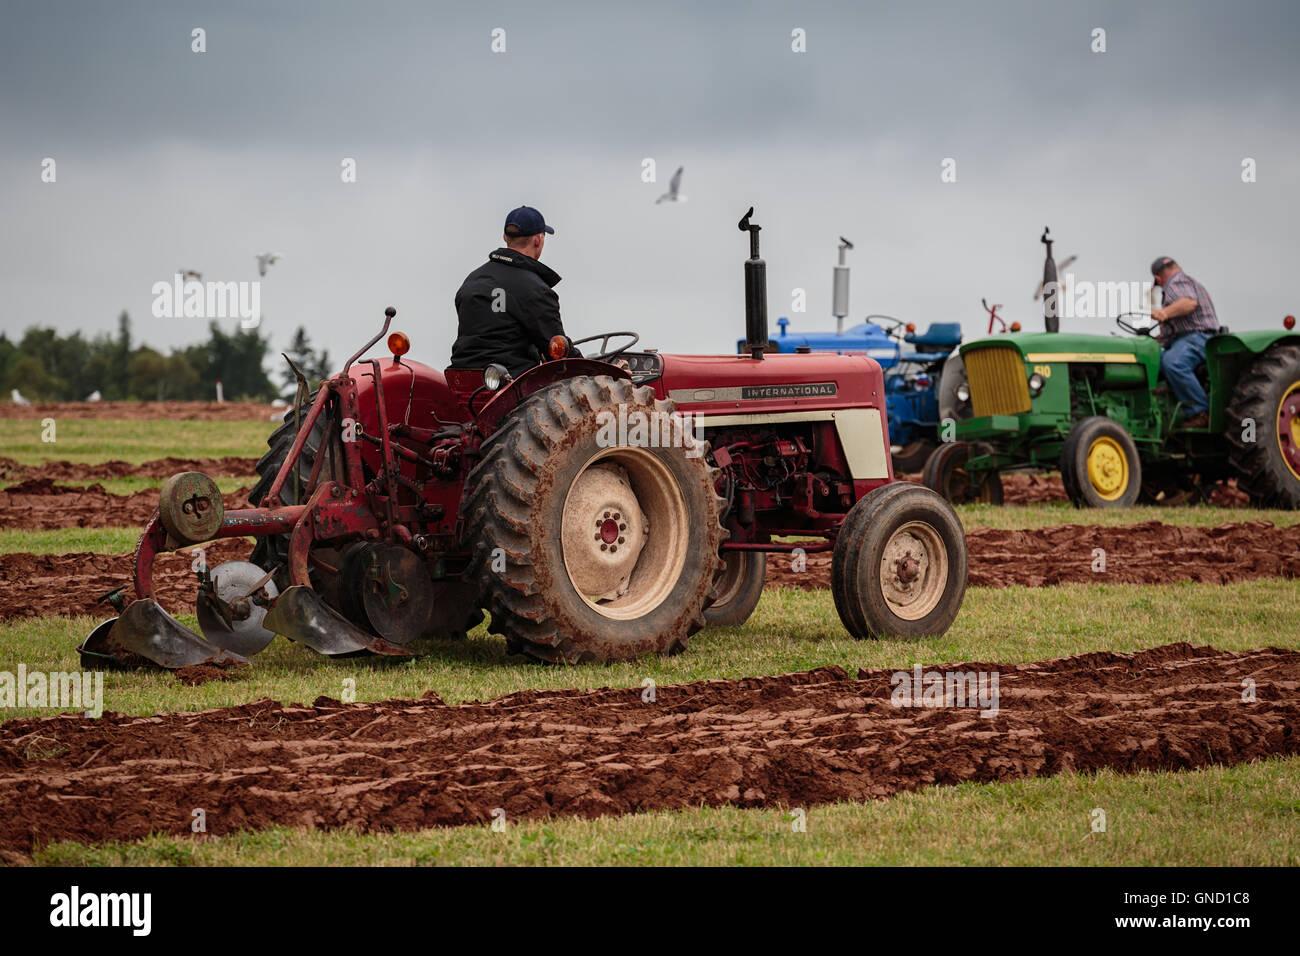 Prince Edward Island, Canada, Aug 27,2016. Competitors at the Prince Edward Island Plowing Match & Agricultural - Stock Image